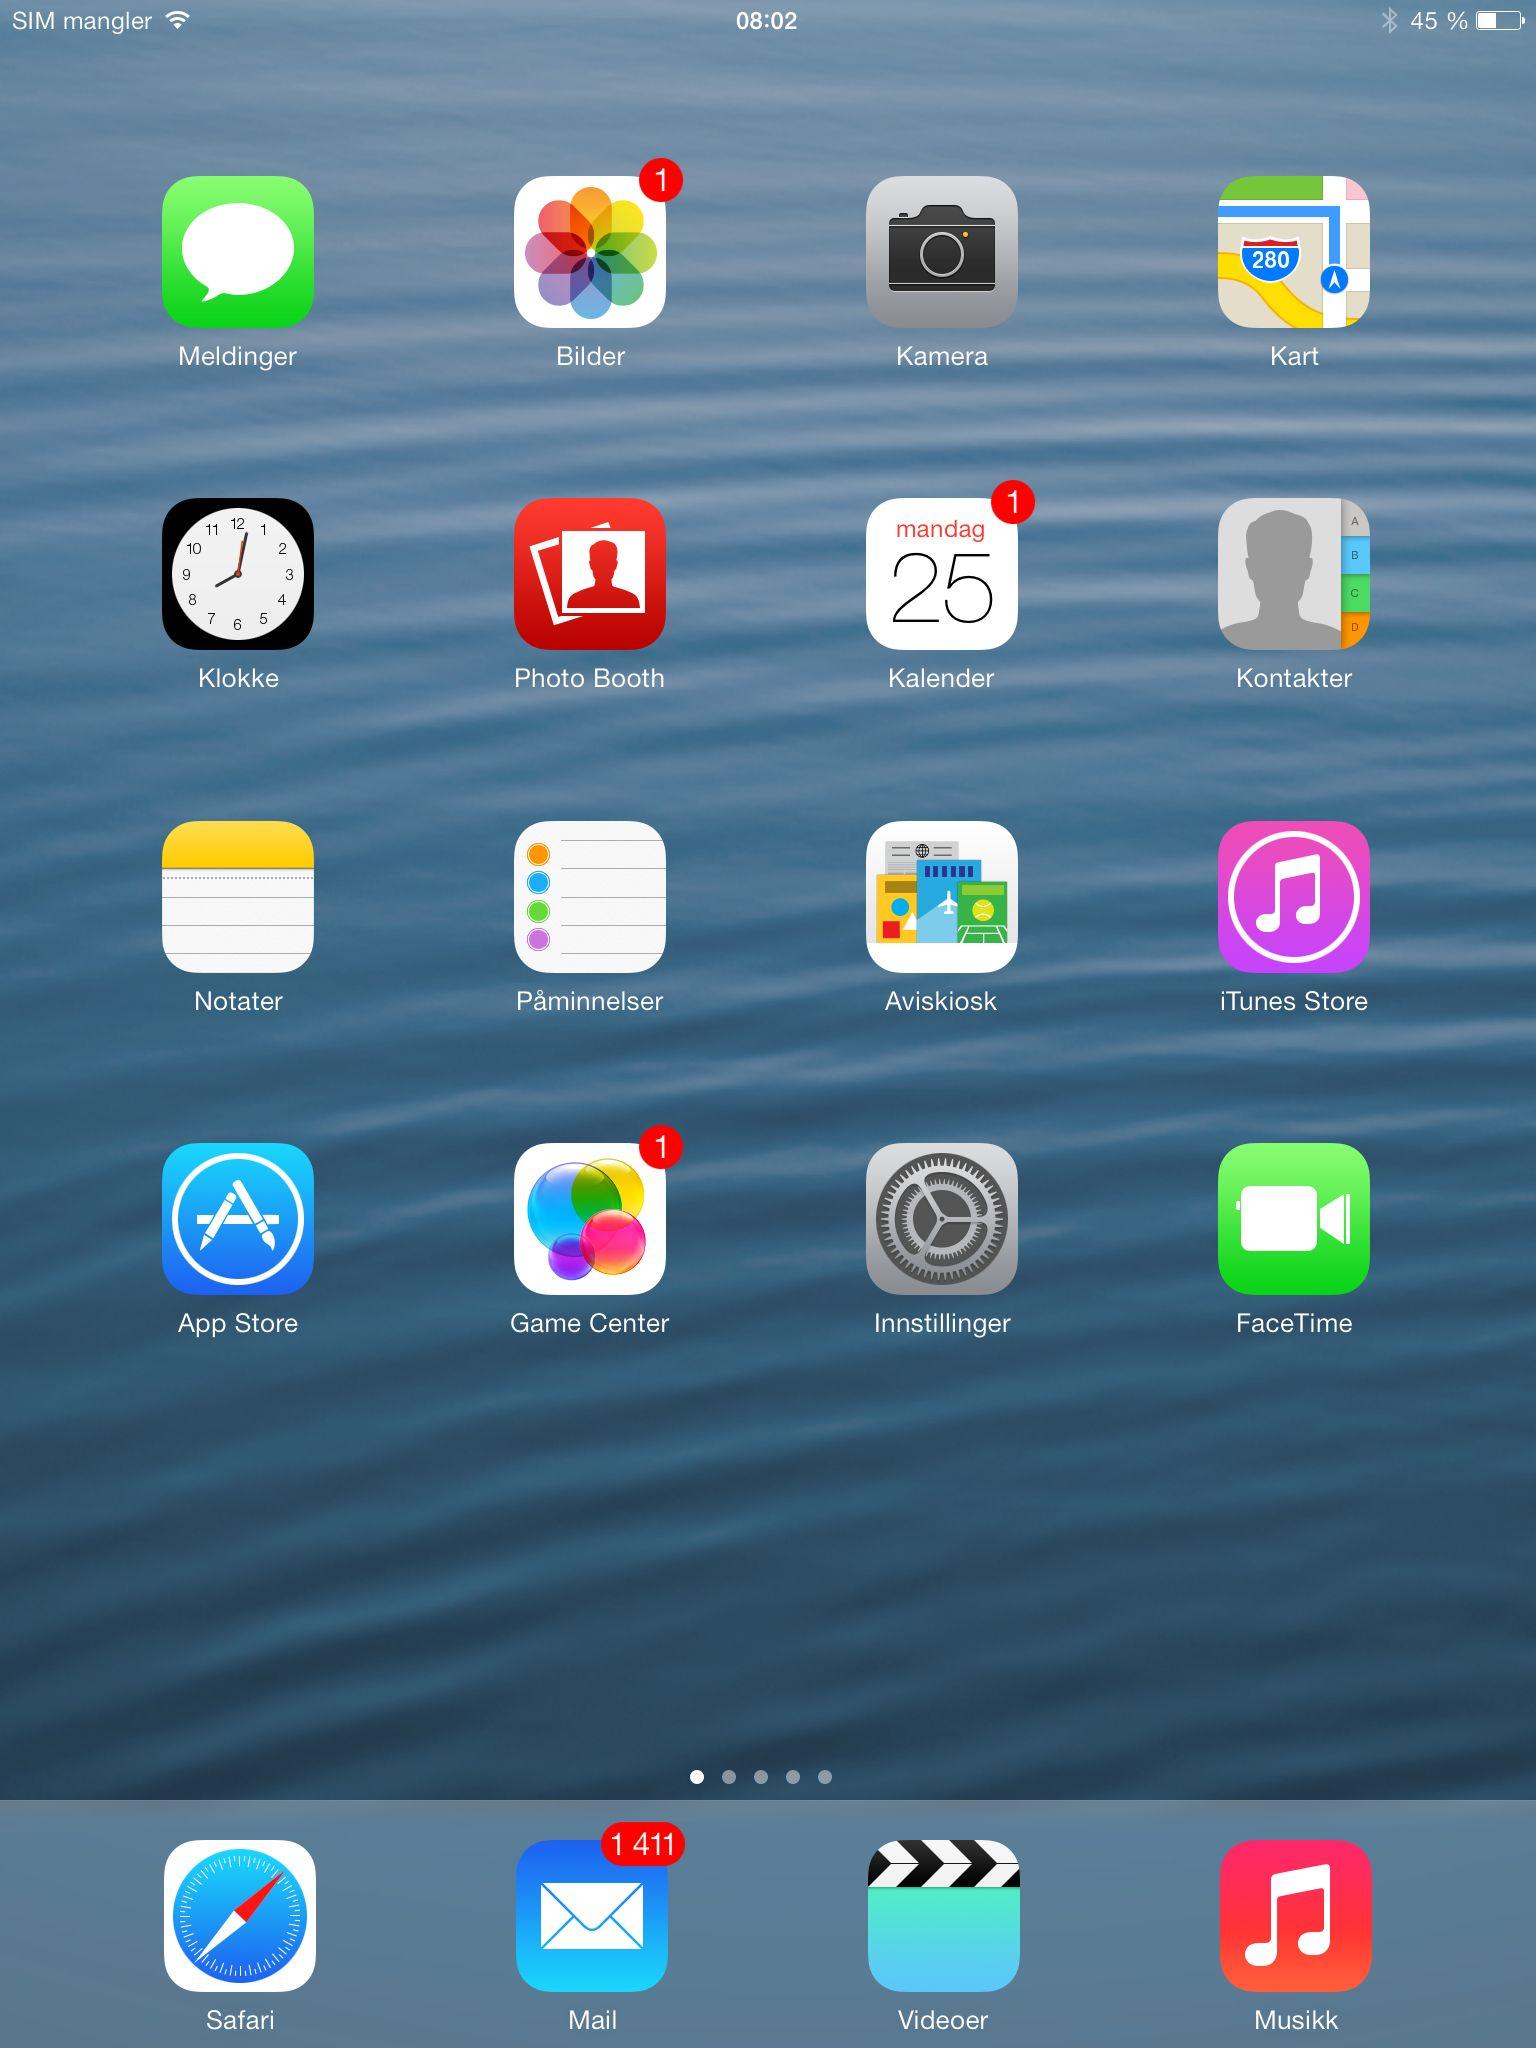 Slik ser appmenyen i iOS 7 ut.Foto: Finn Jarle Kvalheim, Amobil.no